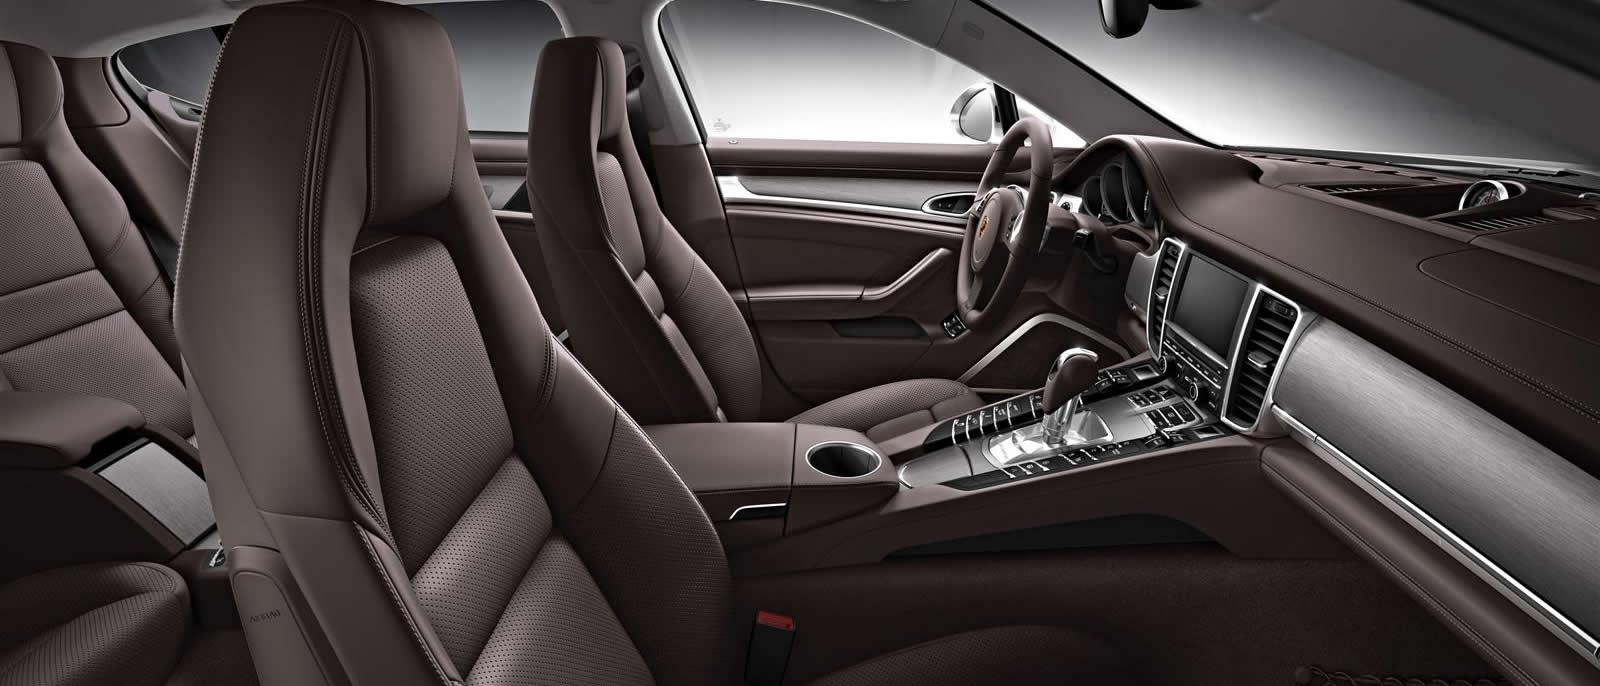 2016 Porsche Panamera 4 Interior